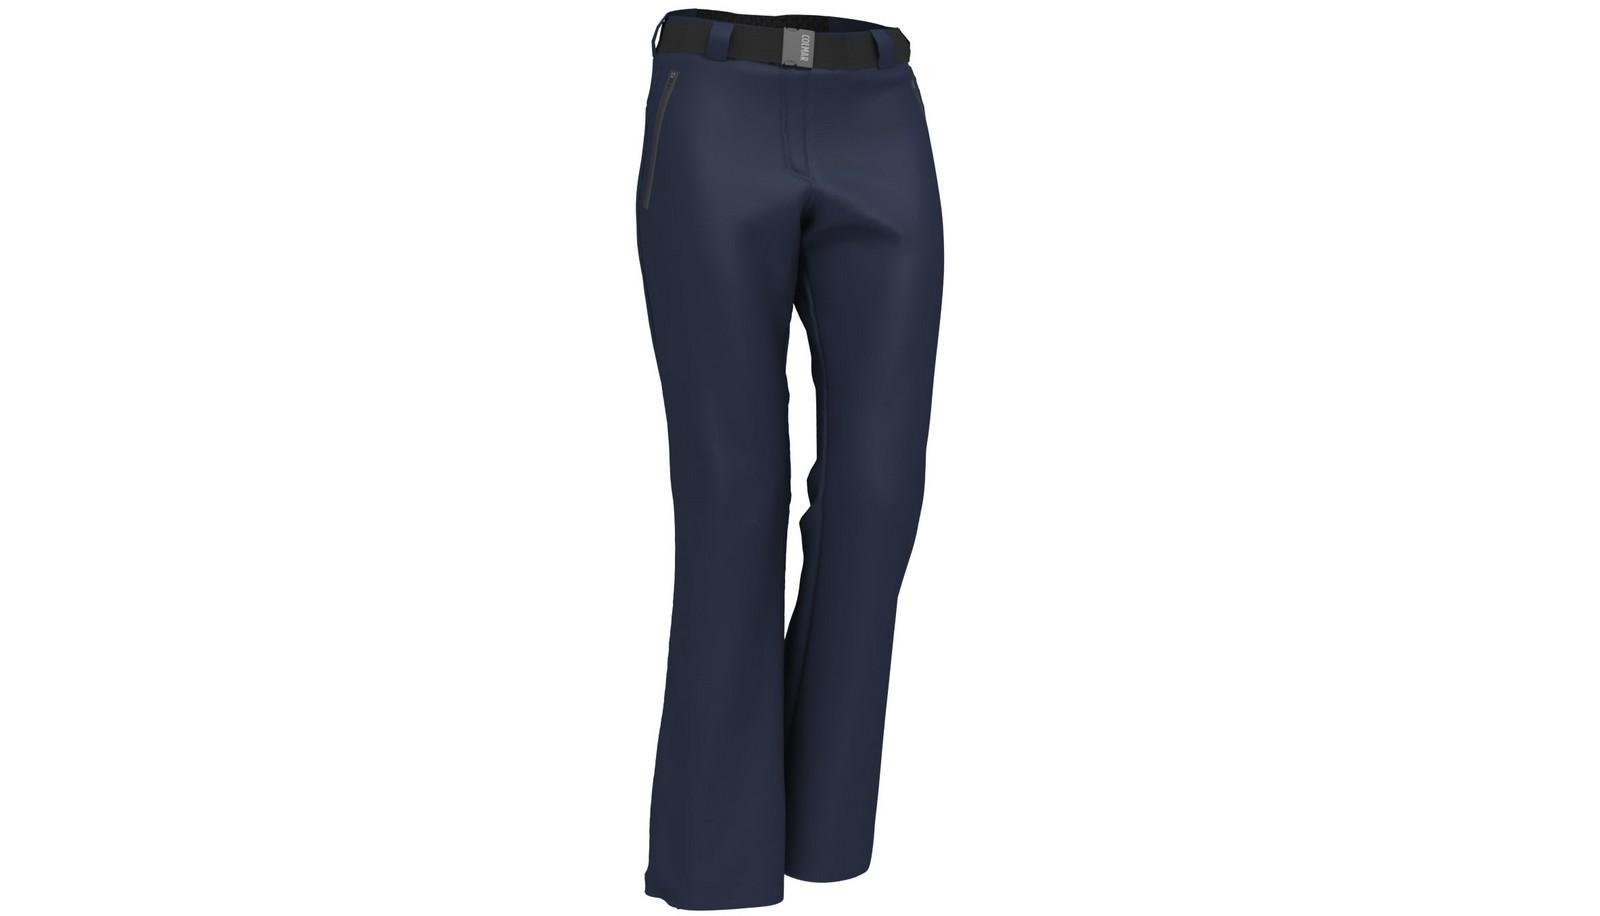 Colmar 1DF - PANTALONI SINTETICI DONNA, ženske smučarske hlače, modra